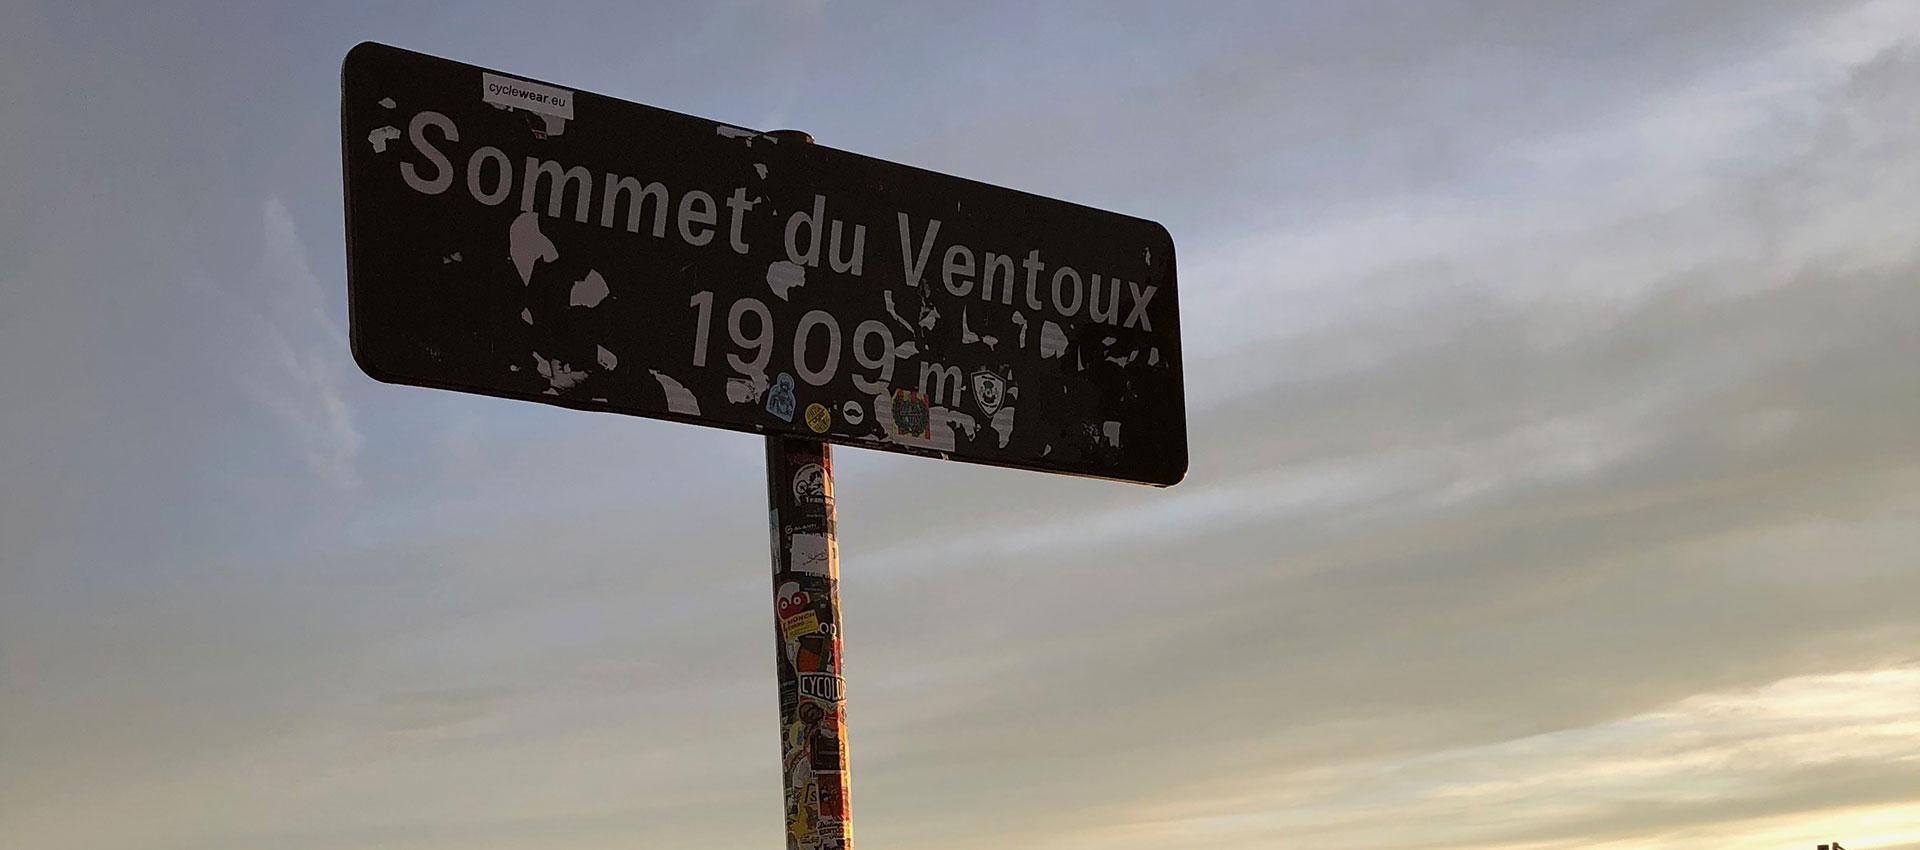 Ventoux Unsaddled - The Ride | Sigma Sports